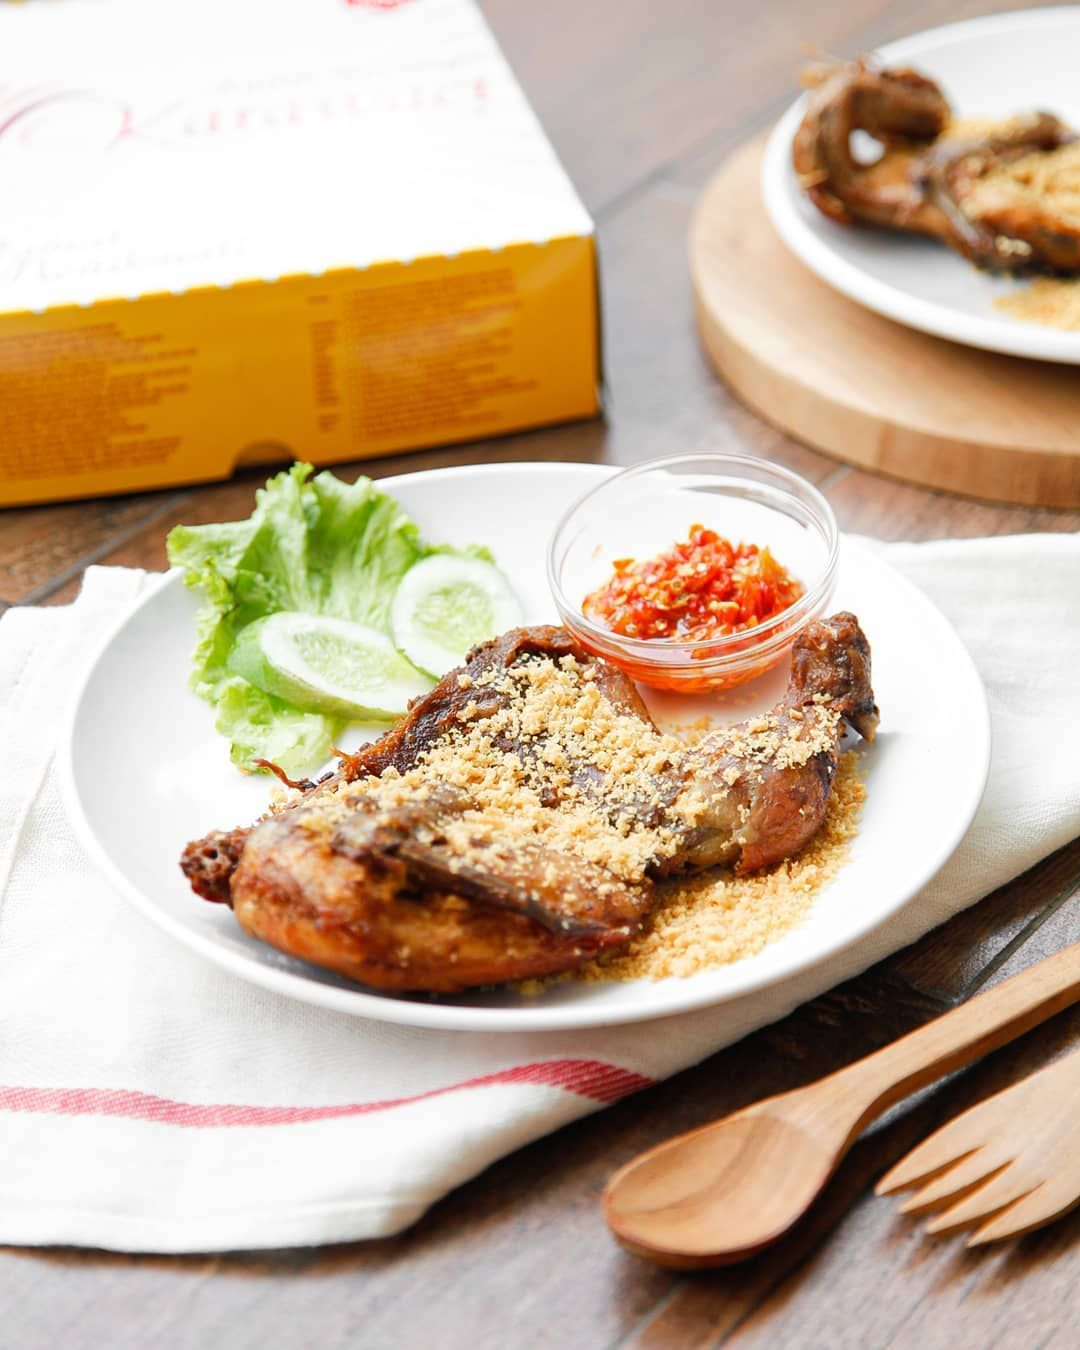 5 Ayam Goreng Paling Hits di Tangerang Selatan